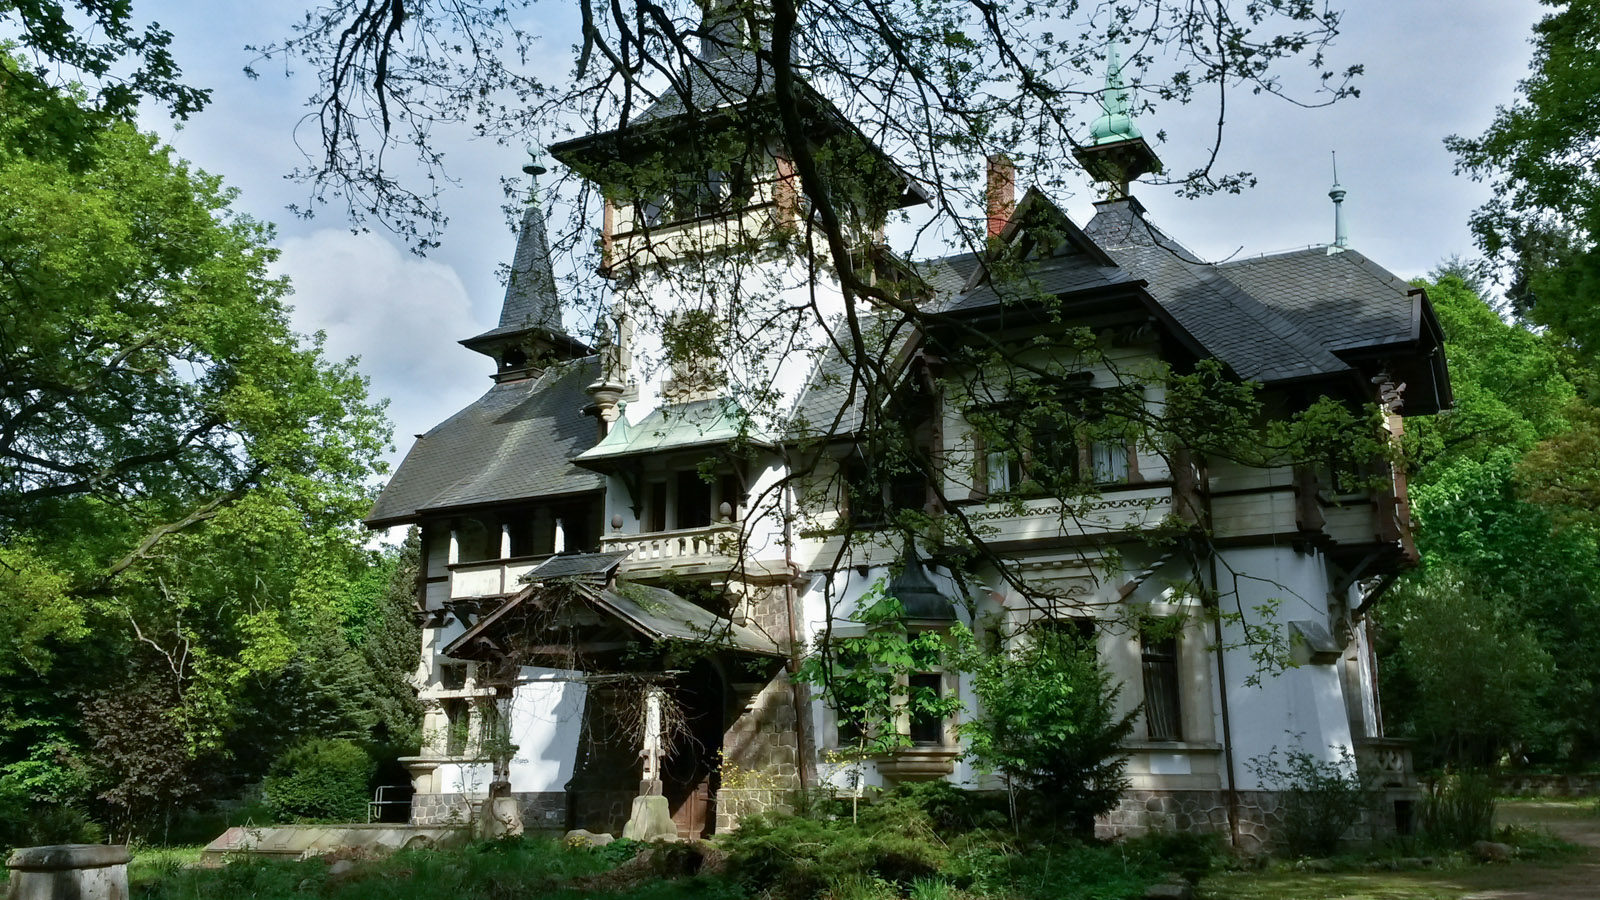 Schloss Heinrichshorst Concert Germany